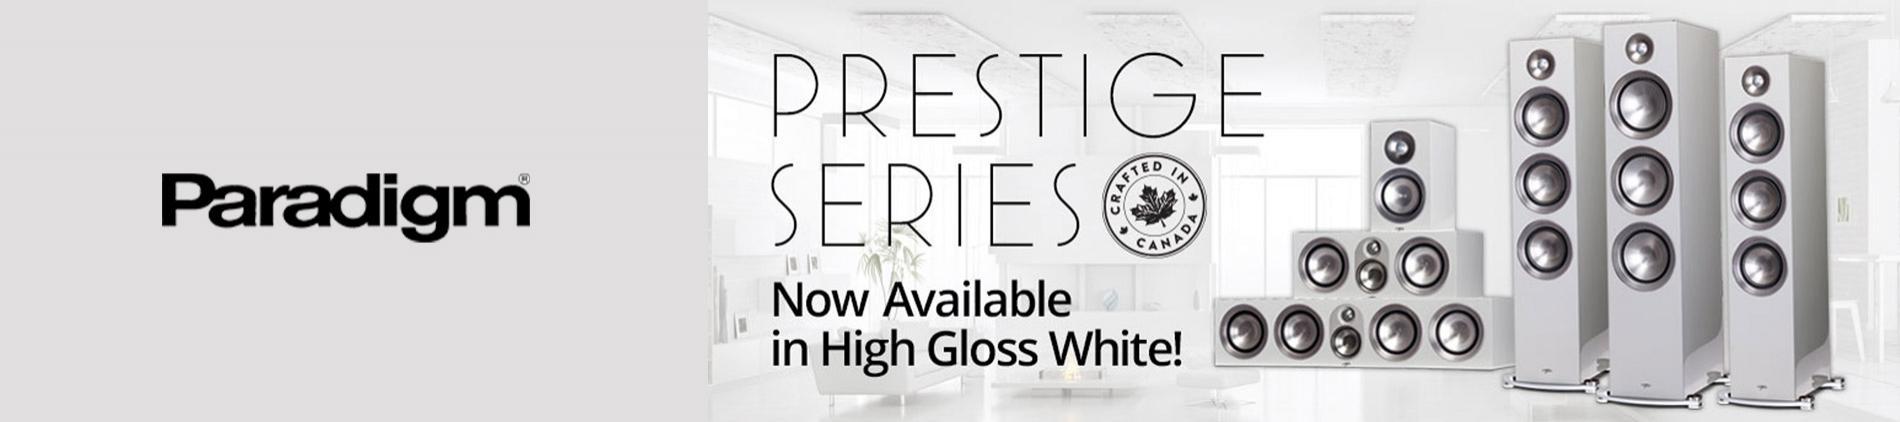 Paradigm Prestige Series